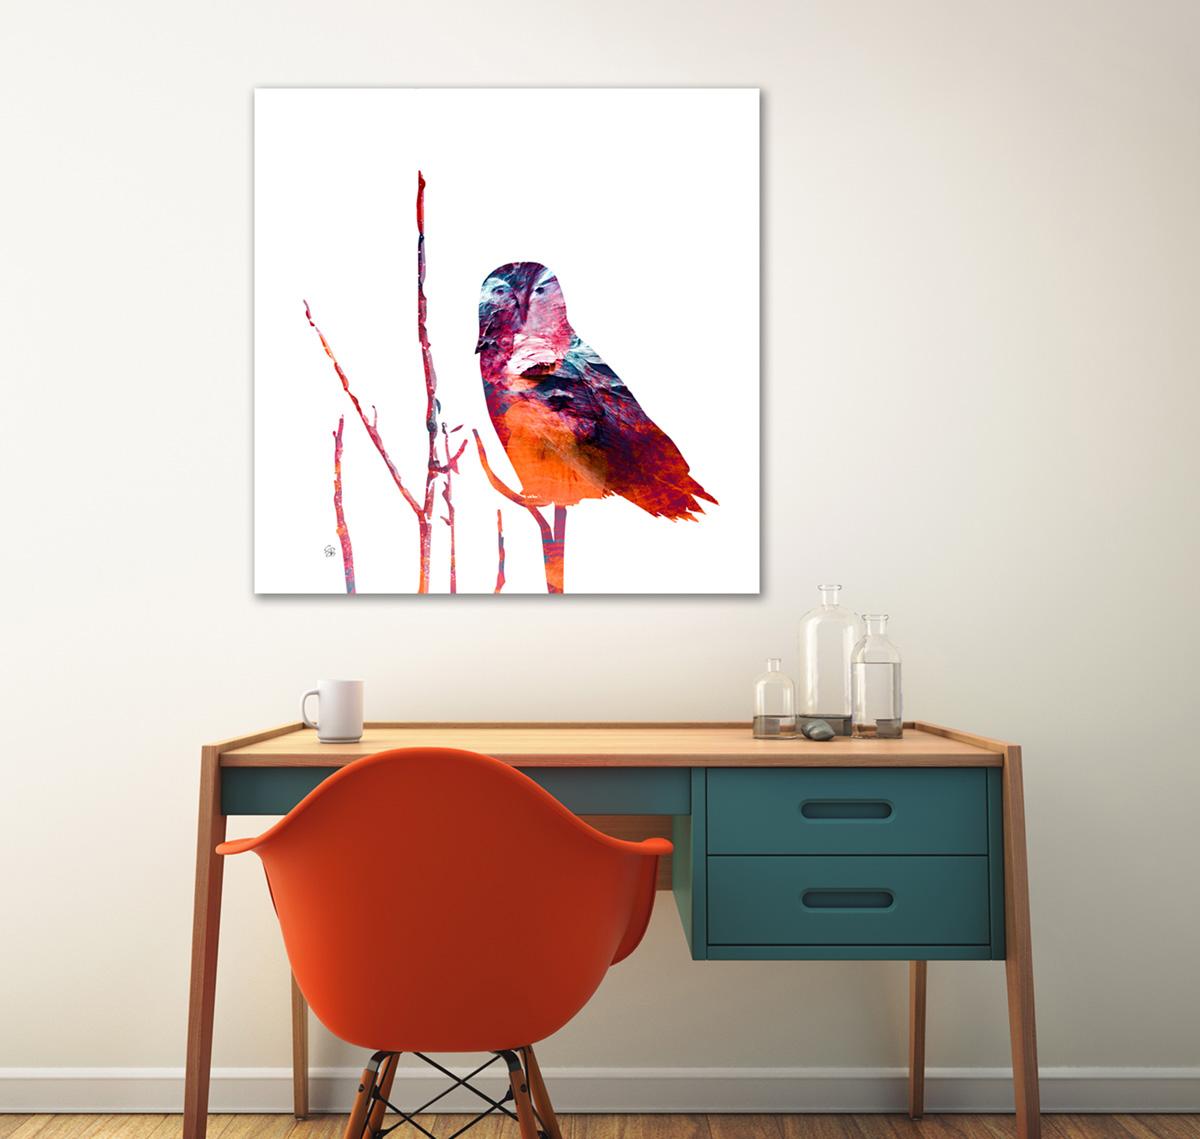 Snowy Owl - Summer Reds